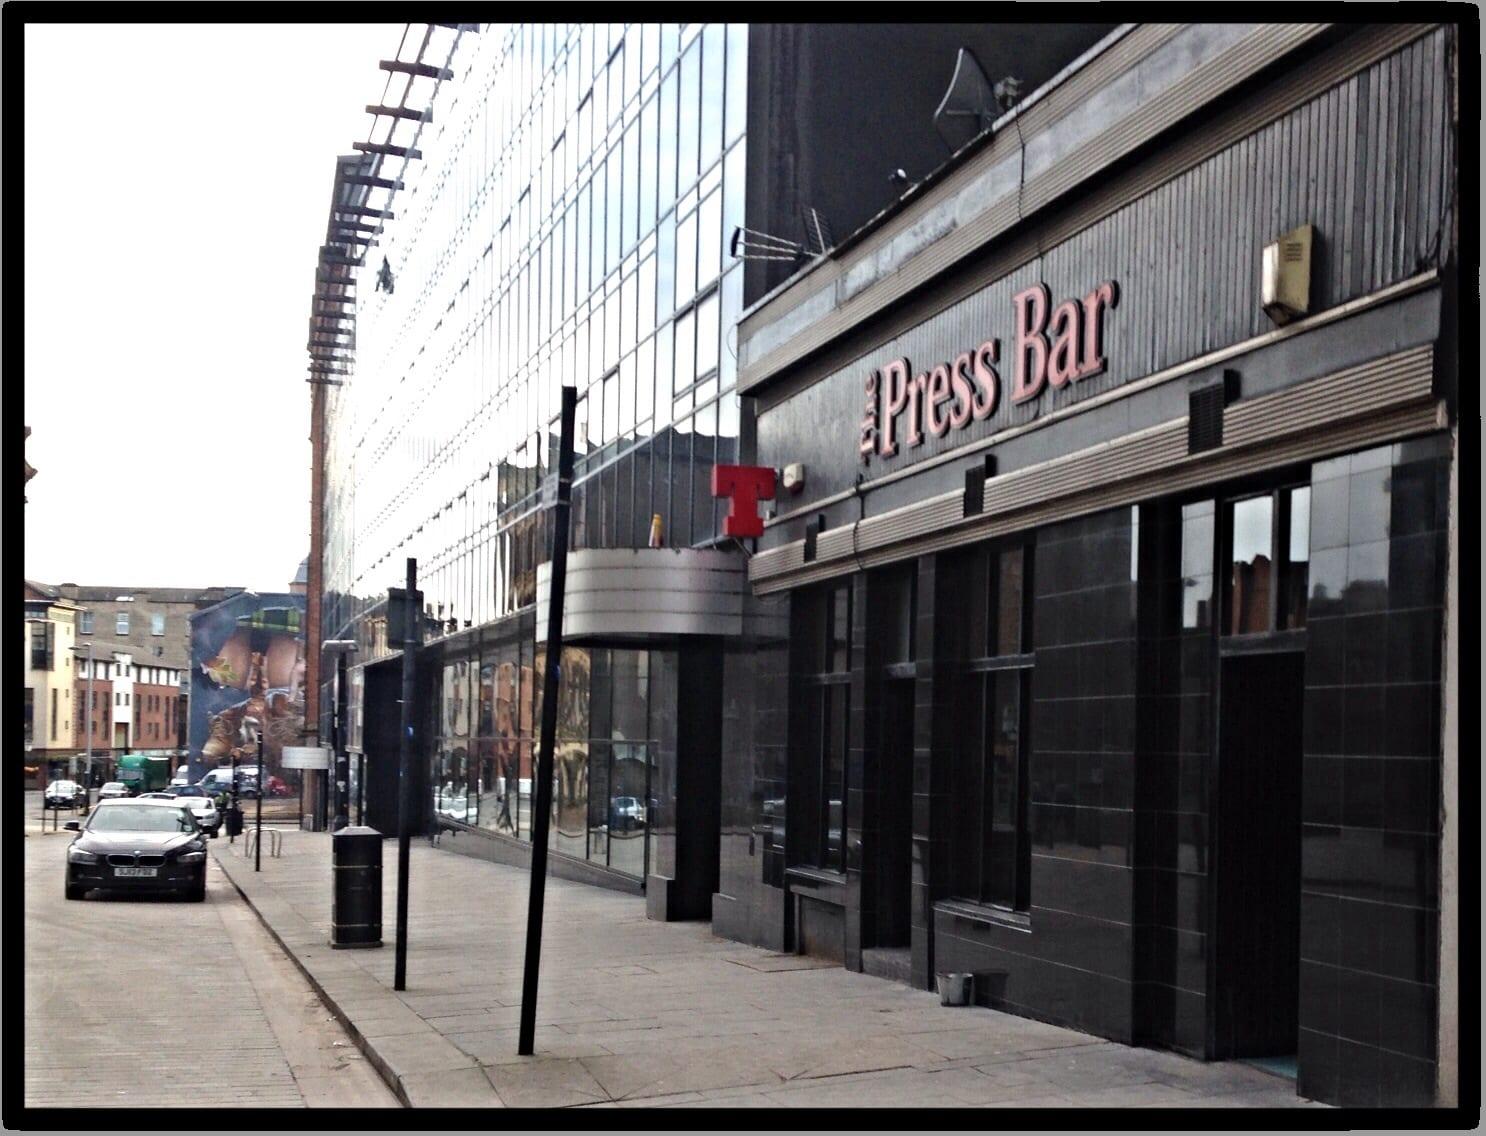 The press bar Albion street Glasgow